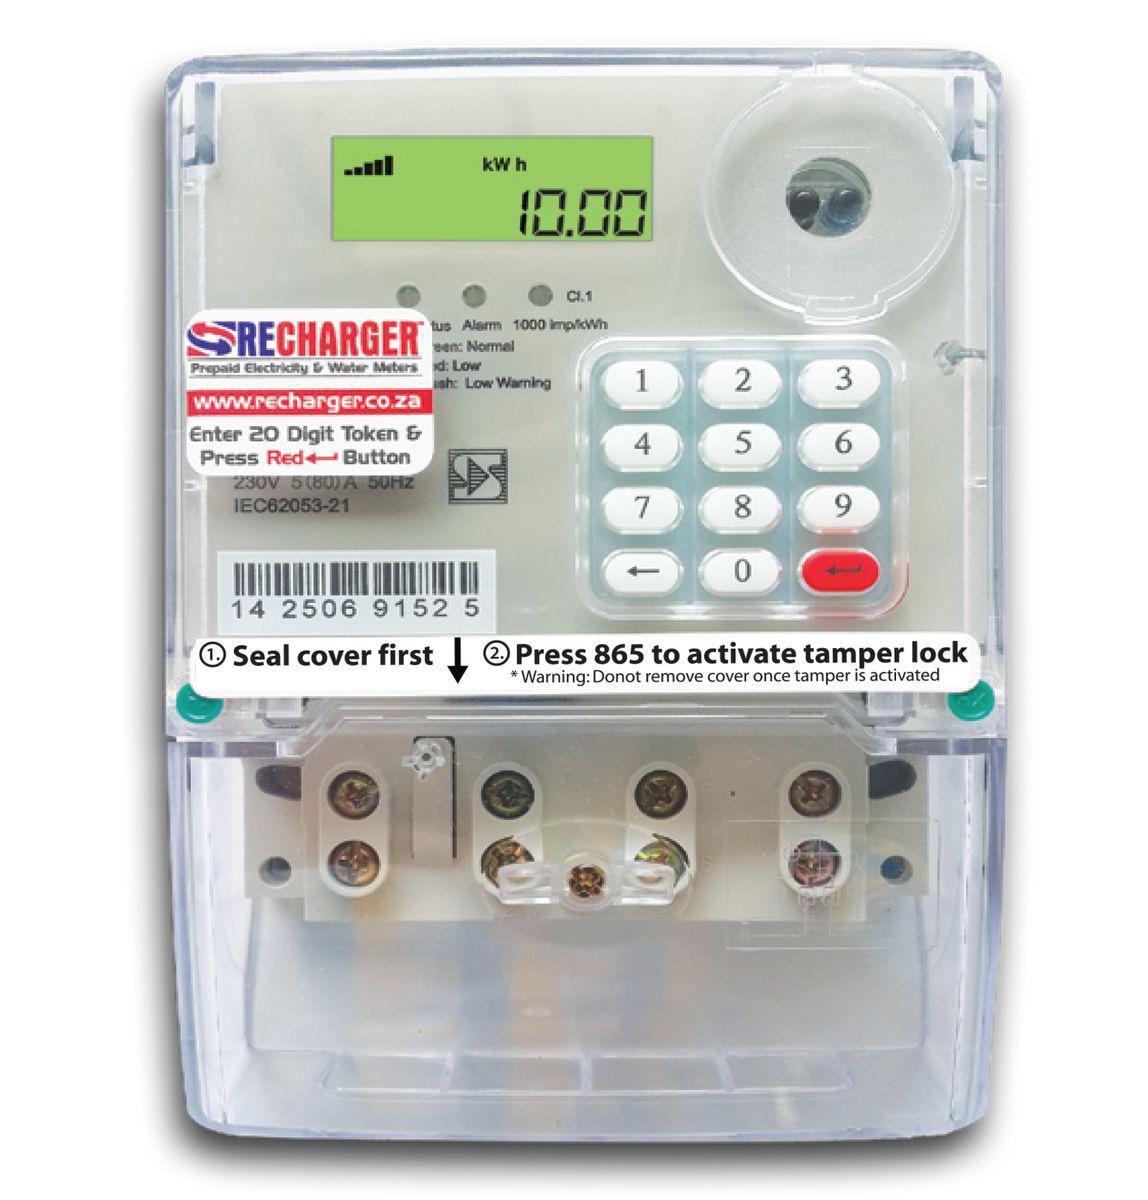 Recharger Prepaid Electricity Meter 80amp Buy Online In